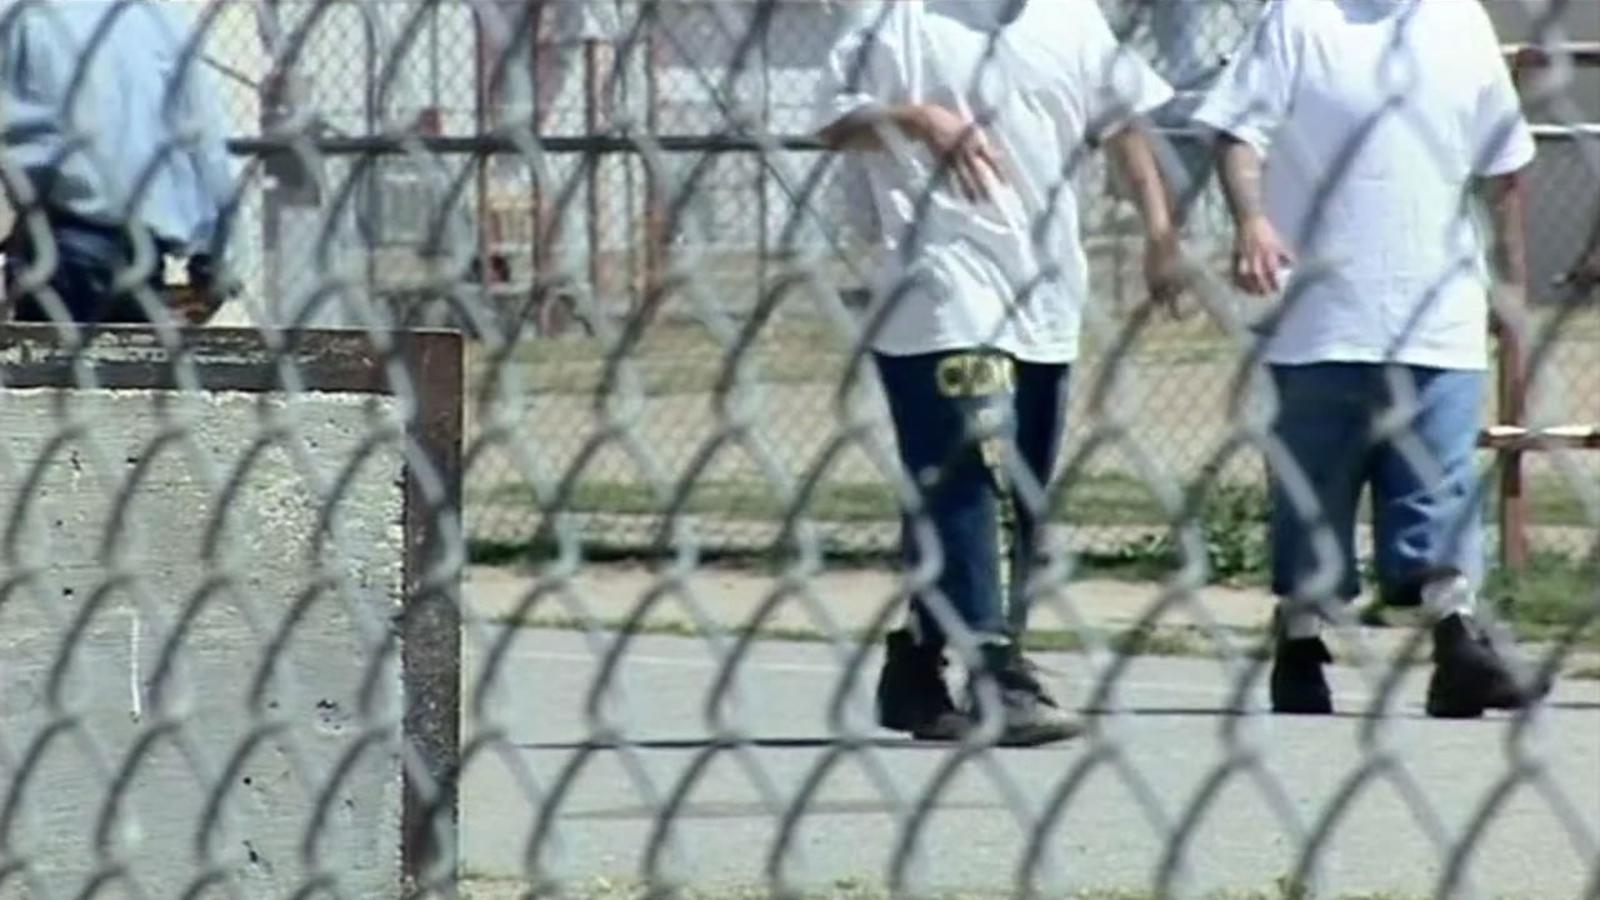 Massive San Jose bust of Nuestra Familia street gang nets 24 arrests